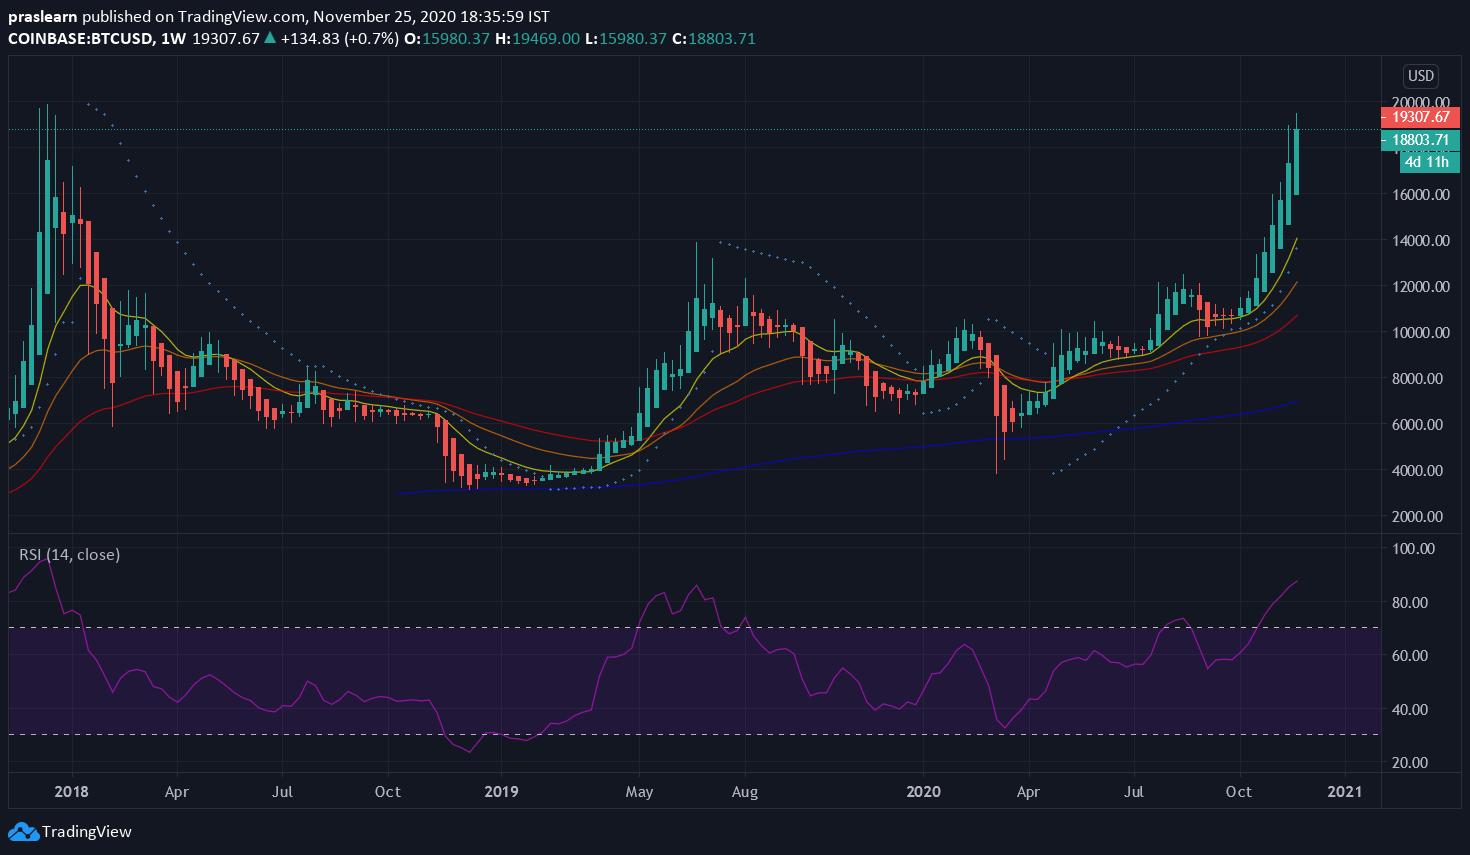 BTC/USD Weekly Chart: TradingView